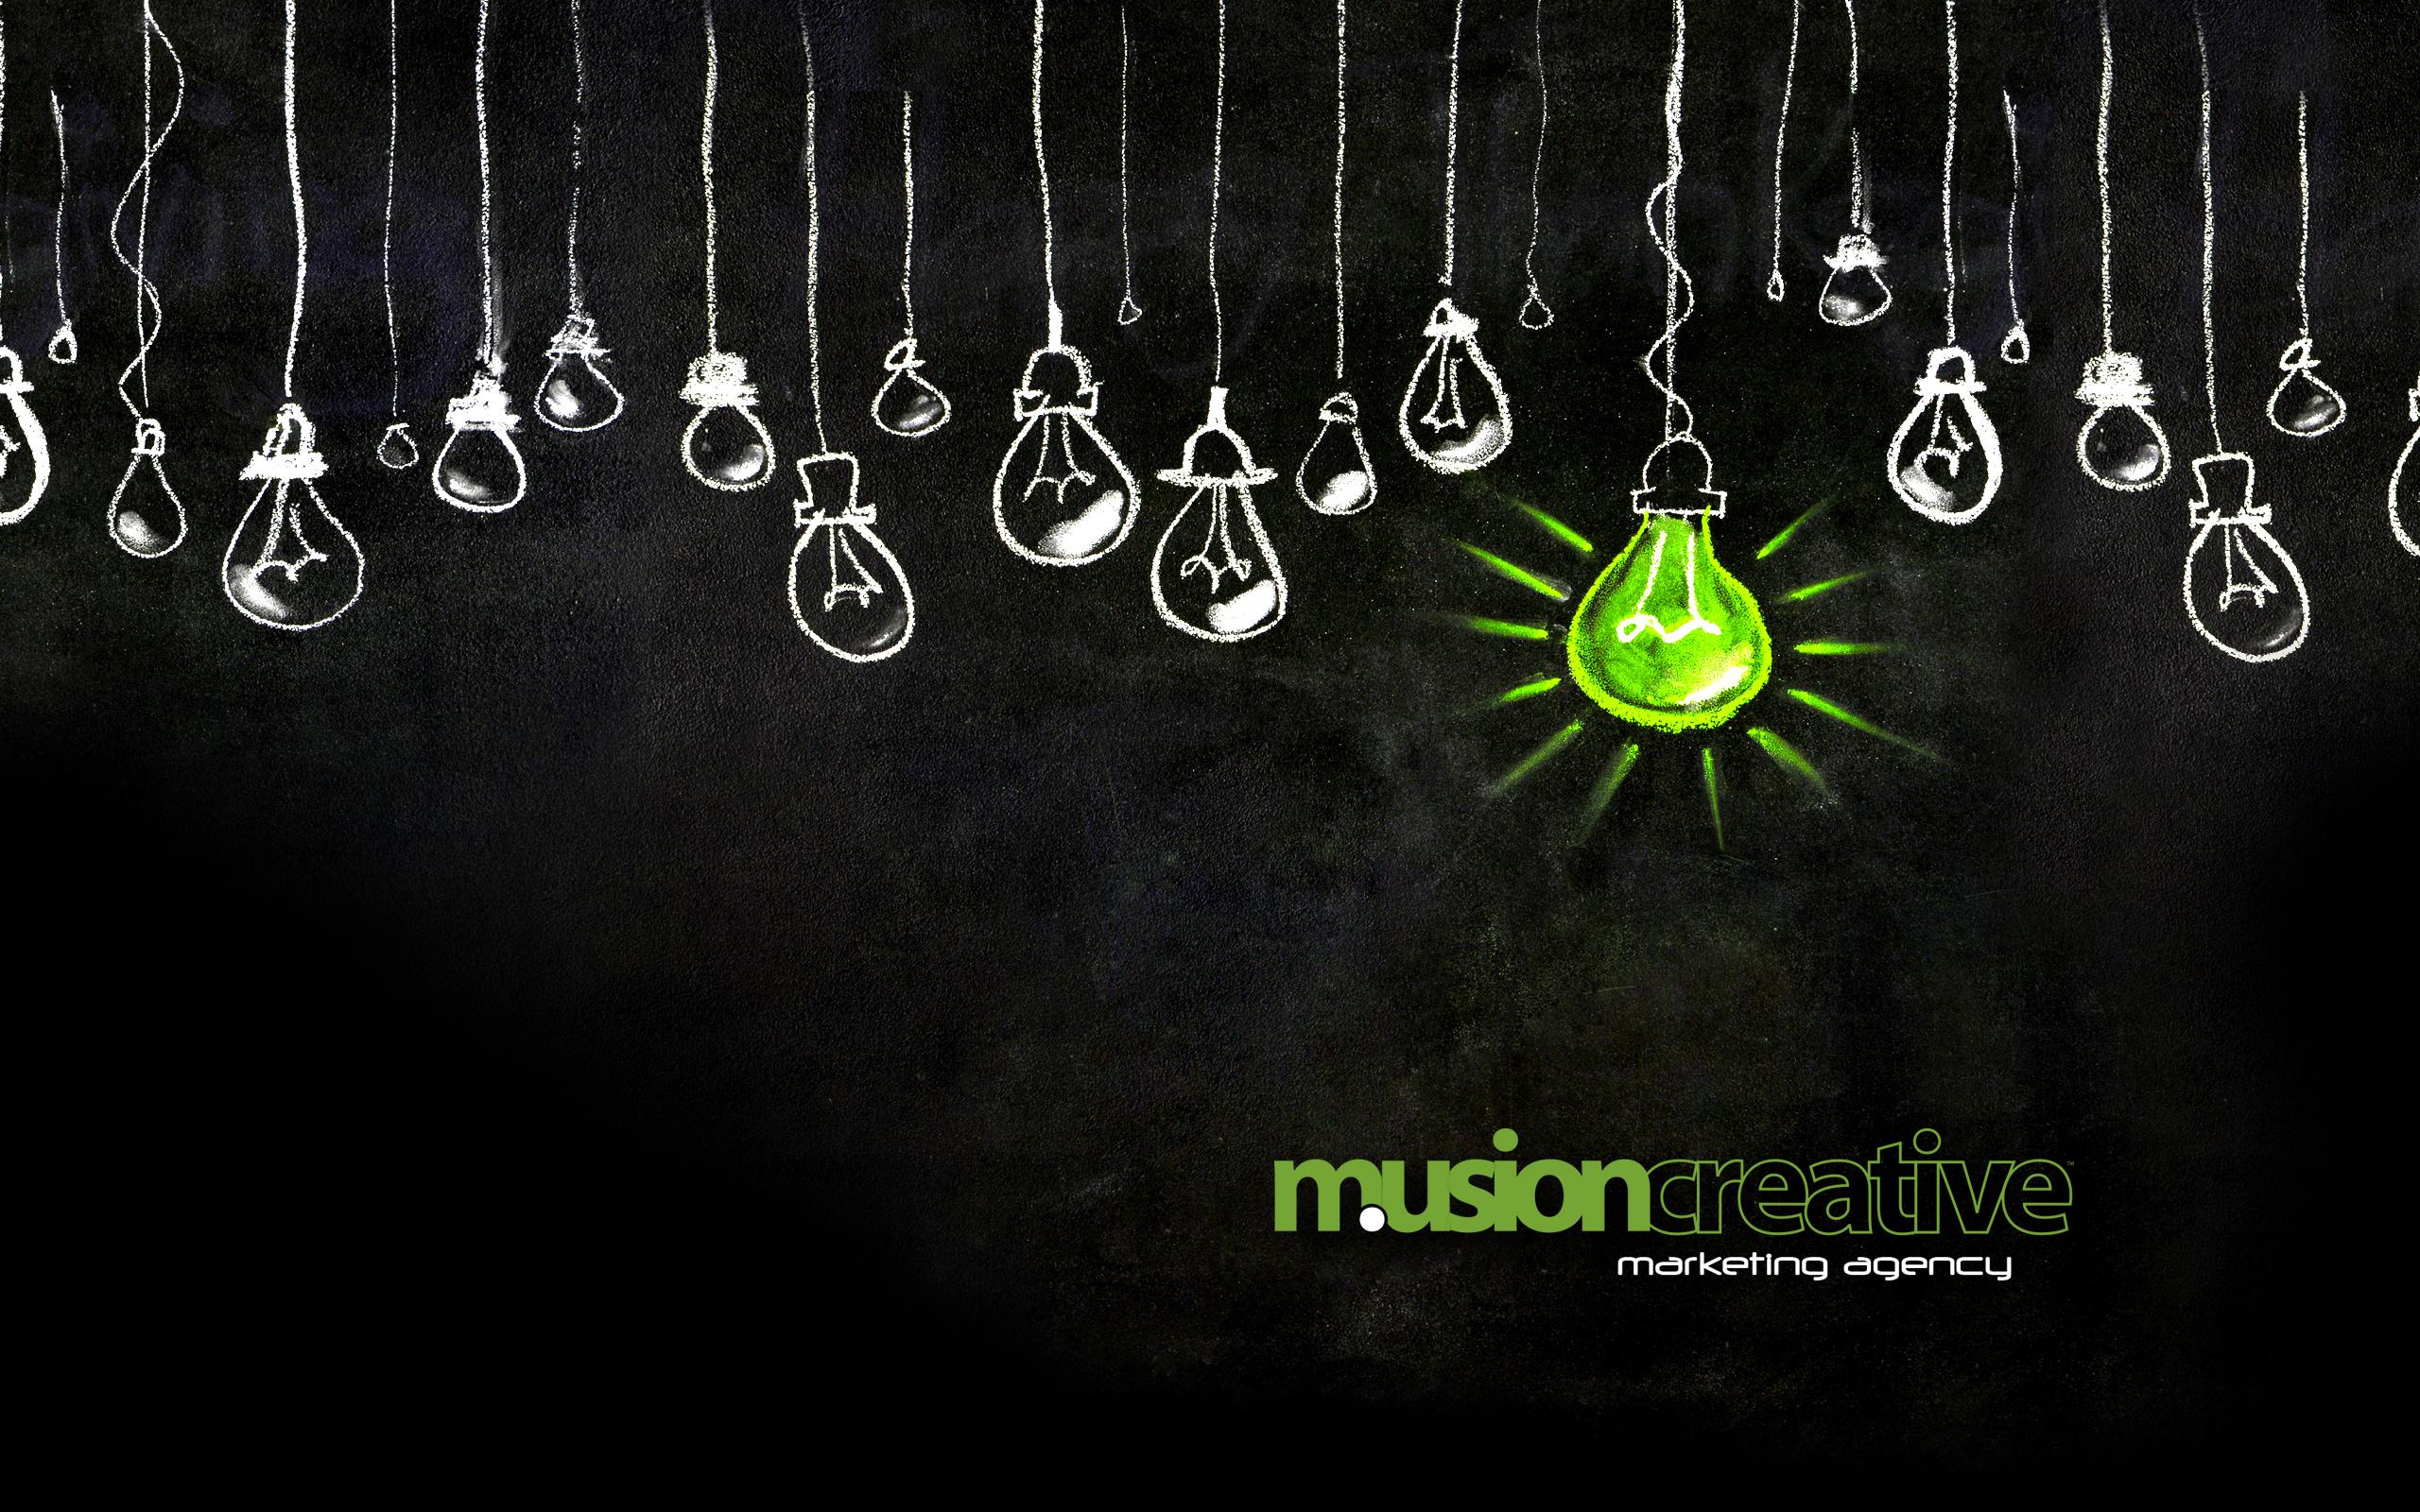 Musion Creative Marketing Agency image 0